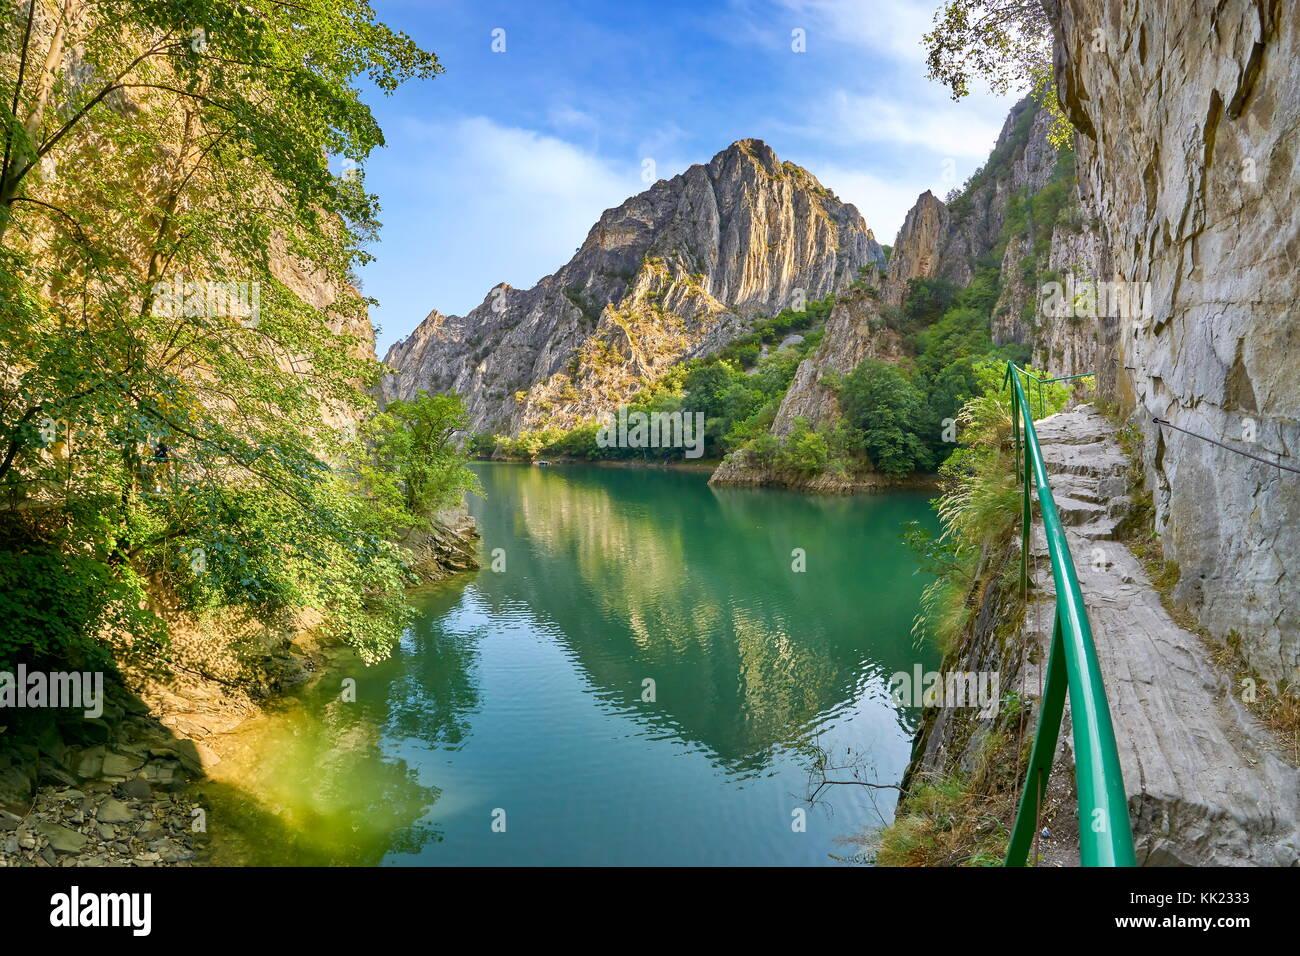 Tourist trail in the Matka Canyon, Macedonia - Stock Image